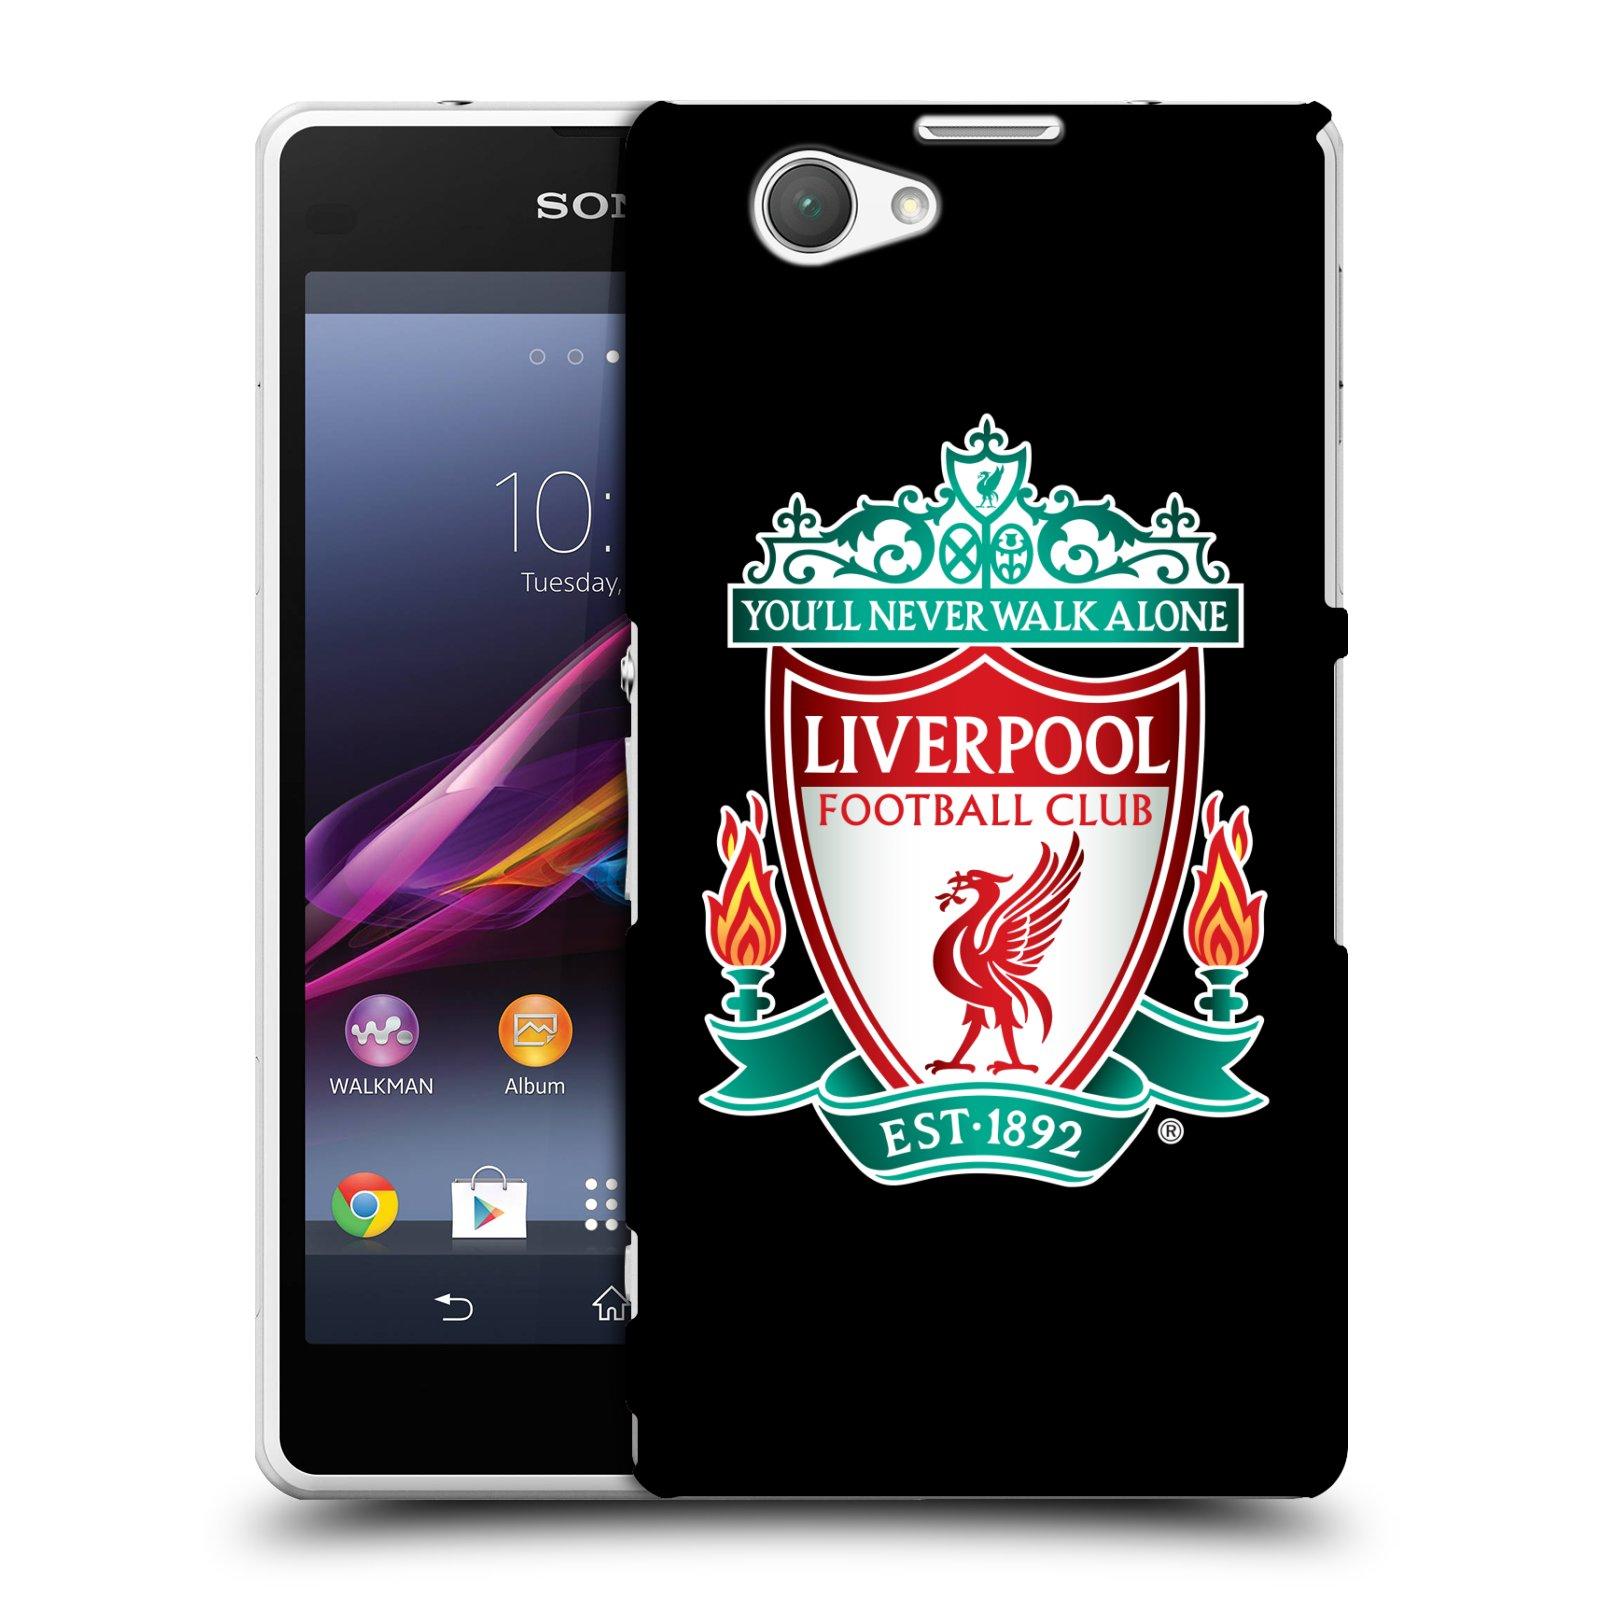 Plastové pouzdro na mobil Sony Xperia Z1 Compact D5503 HEAD CASE ZNAK LIVERPOOL FC OFFICIAL BLACK (Kryt či obal na mobilní telefon Liverpool FC Official pro Sony Xperia Z1 Compact)